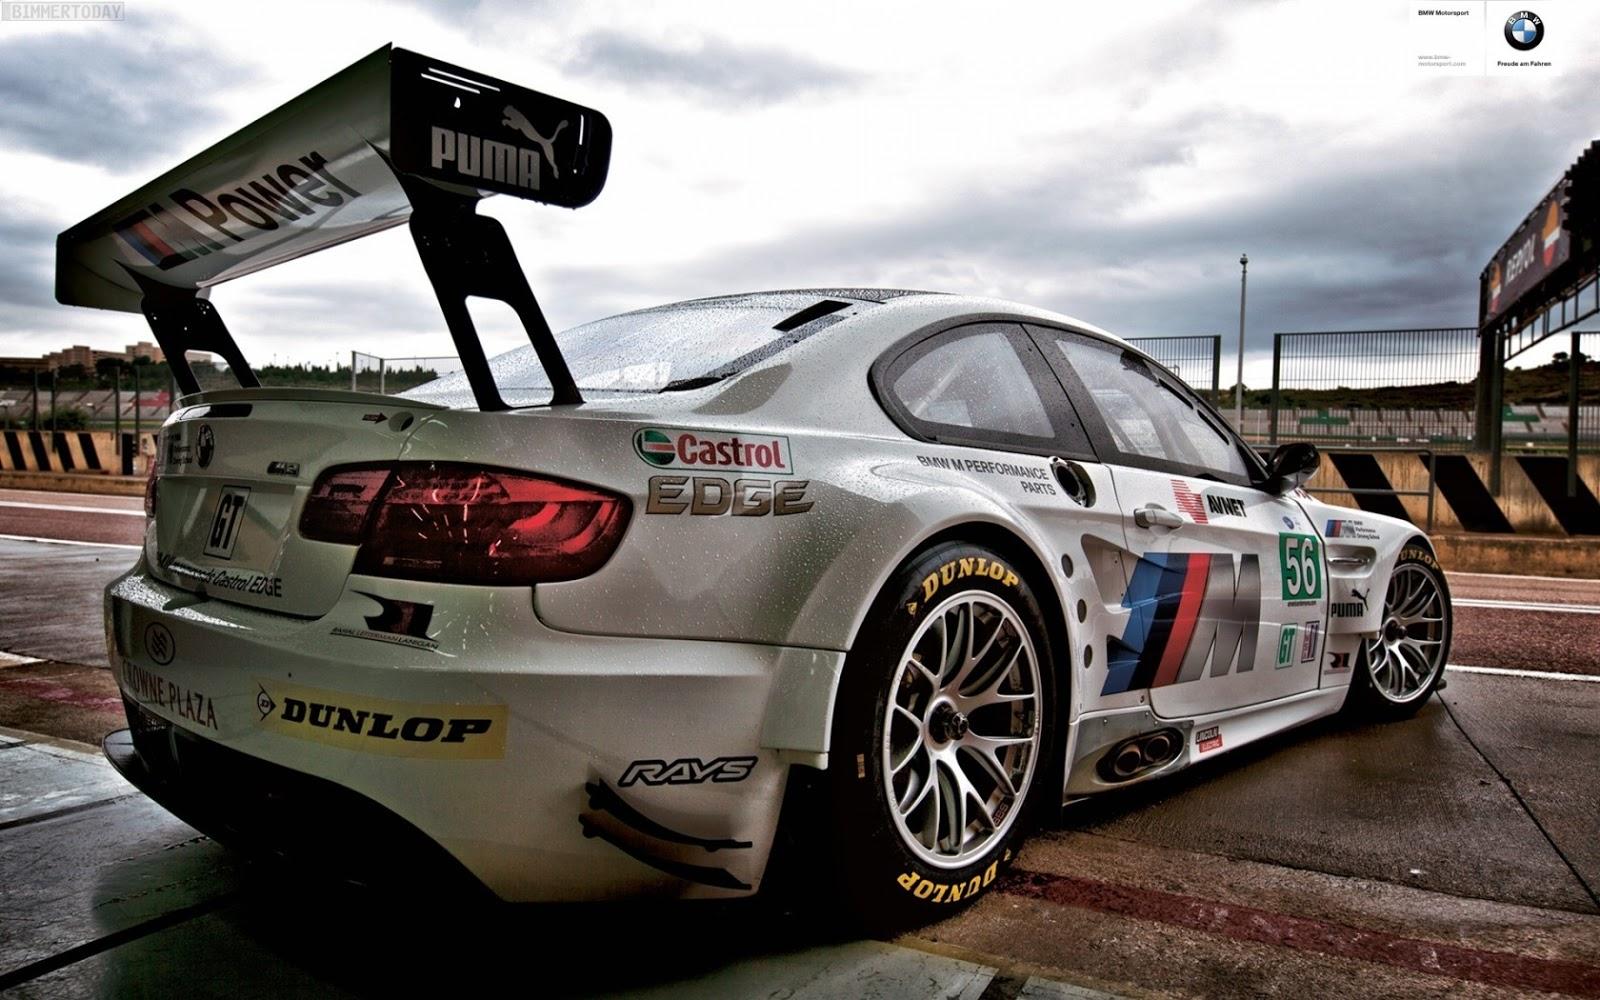 Wallpaper Mobil Bmw Sport: BMW Sport Car Wallpapers